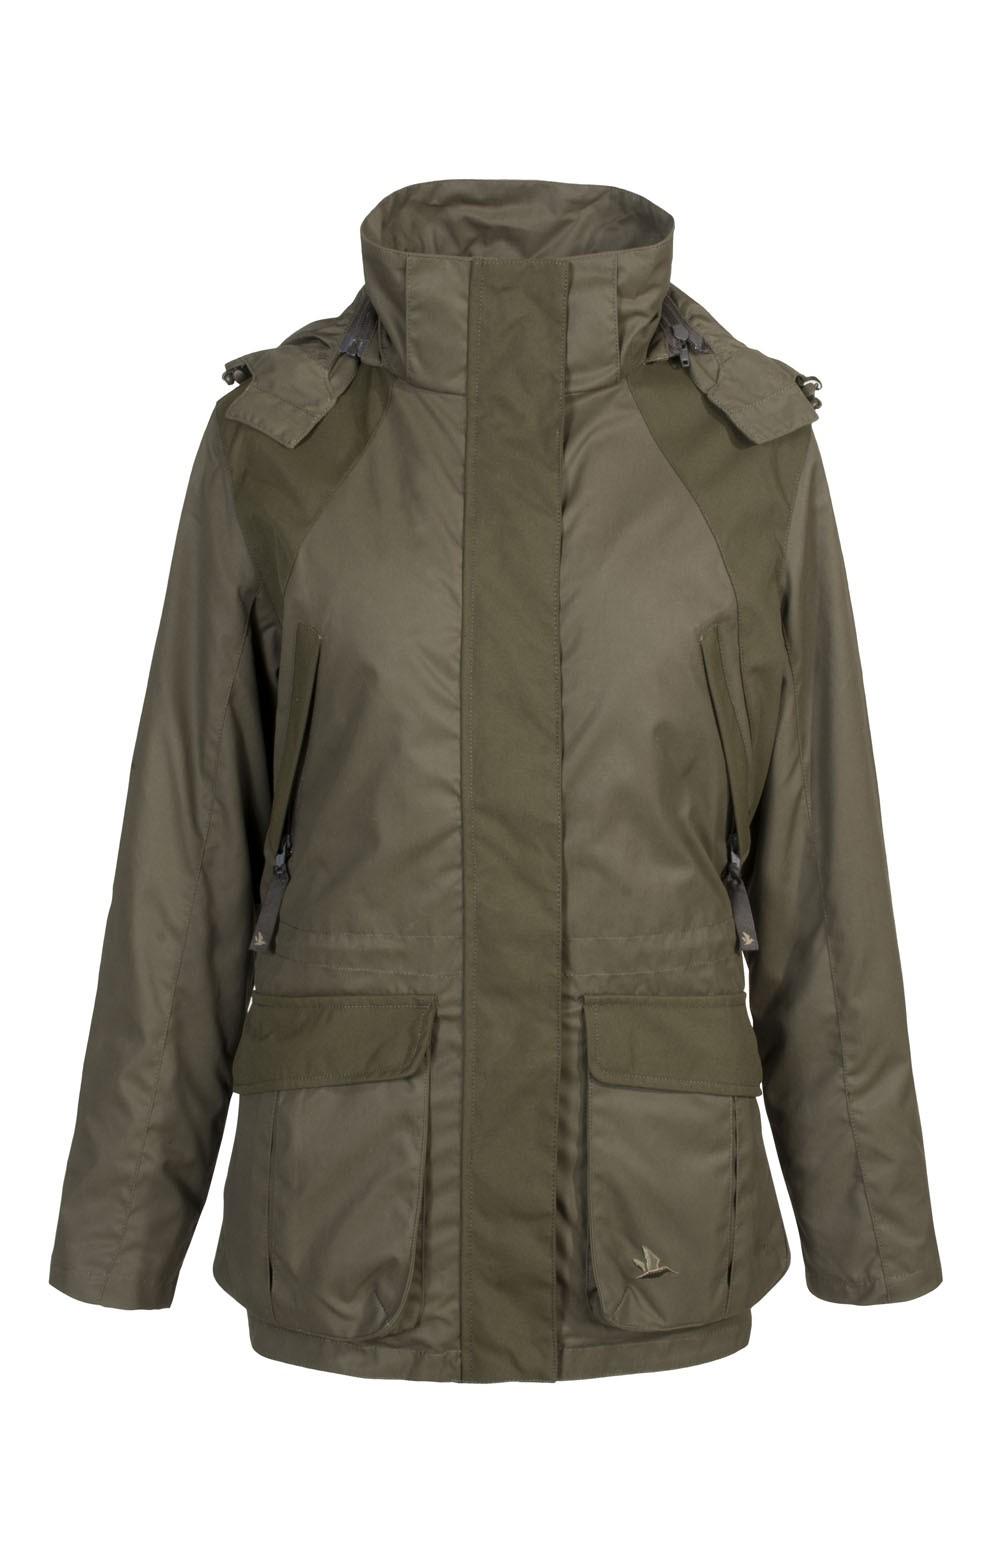 d89f2cf6532e3 Ladies Seeland Exeter Advantage Jacket | Ladies Waterproof & Wet Weather  Jackets | House Of Bruar